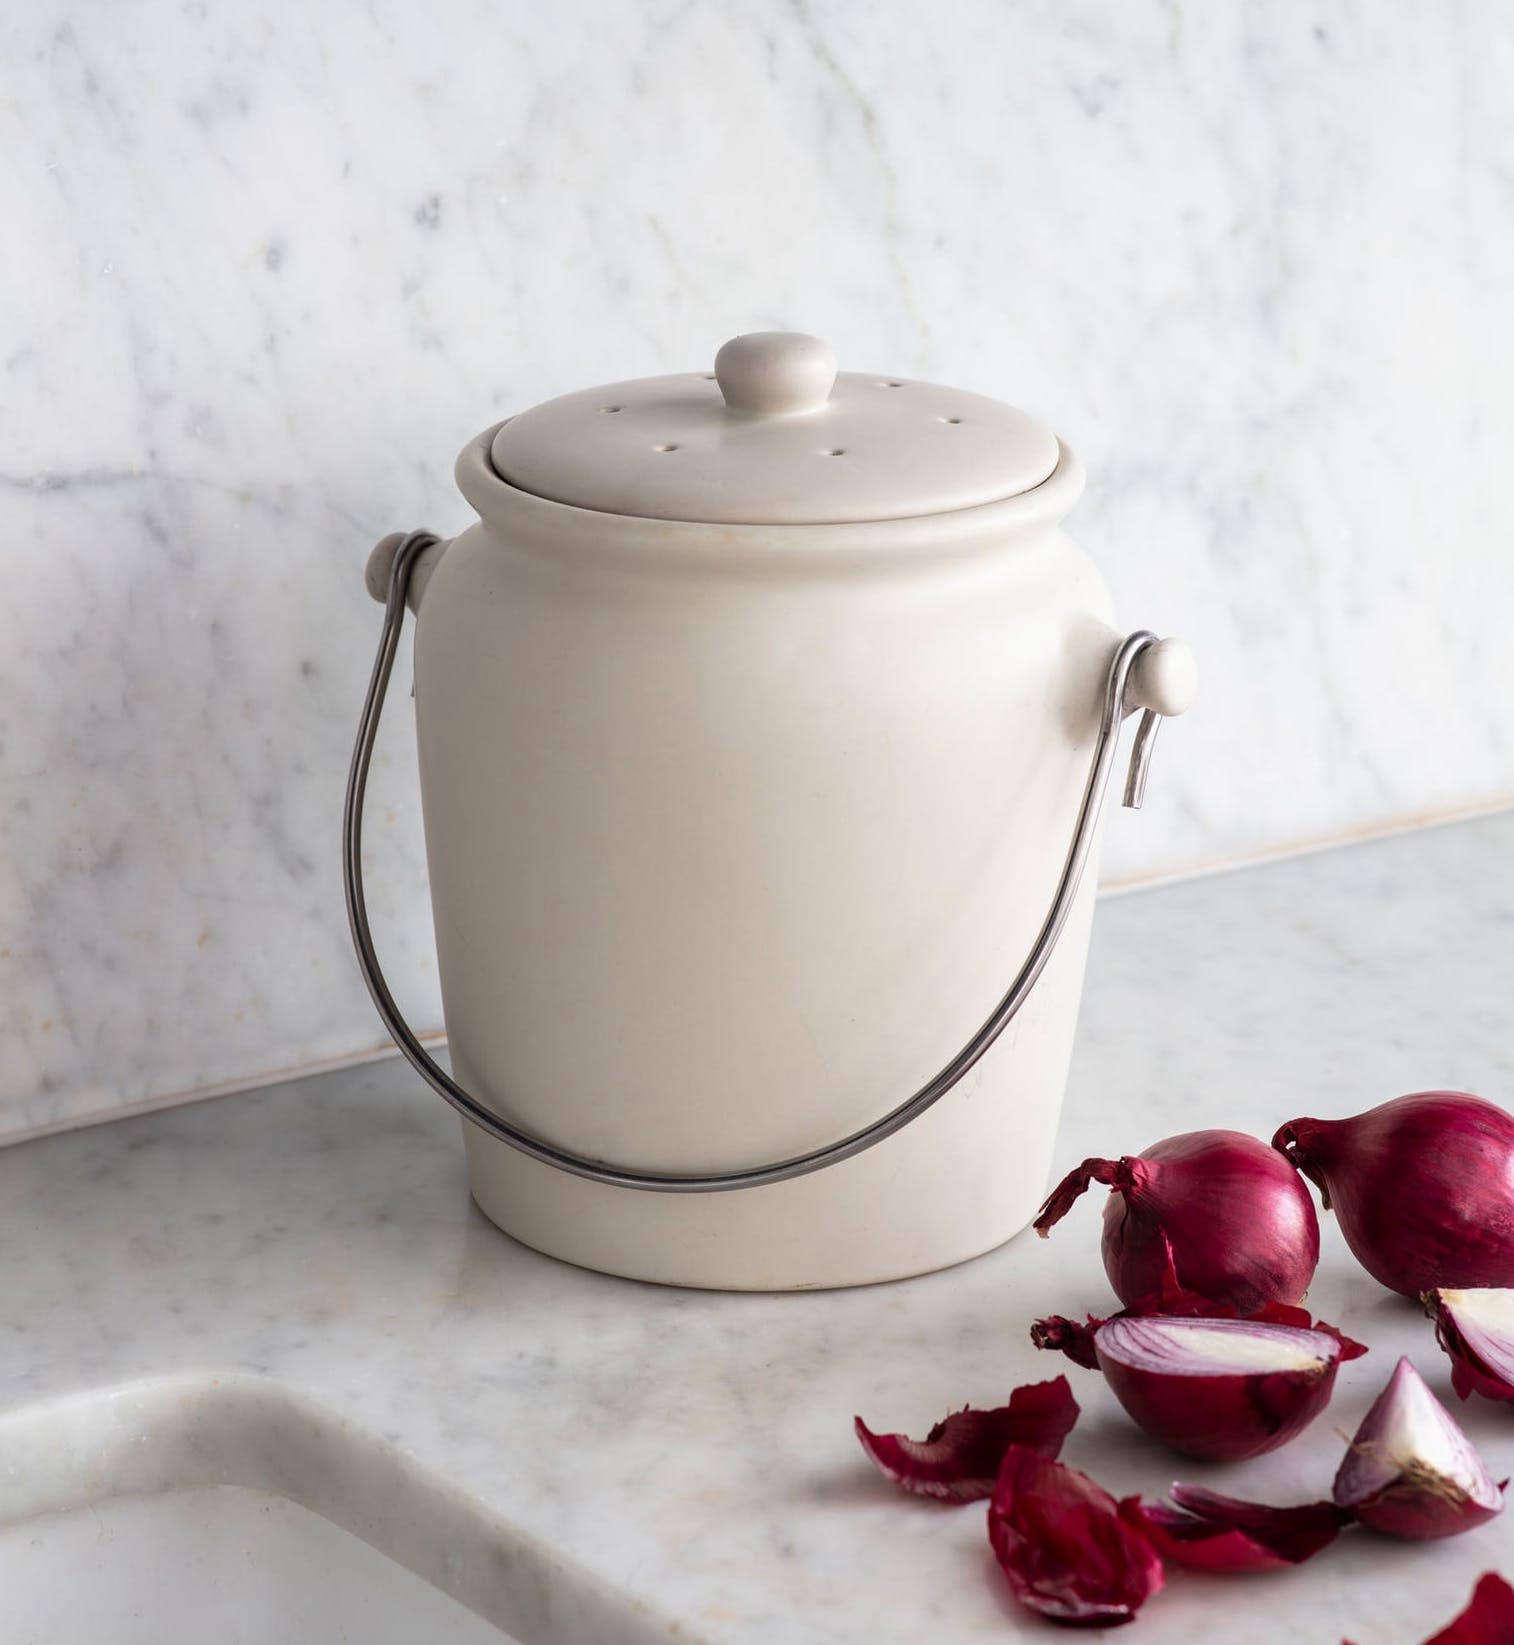 10 Easy Pieces Stylish Kitchen Compost Pails Gardenista